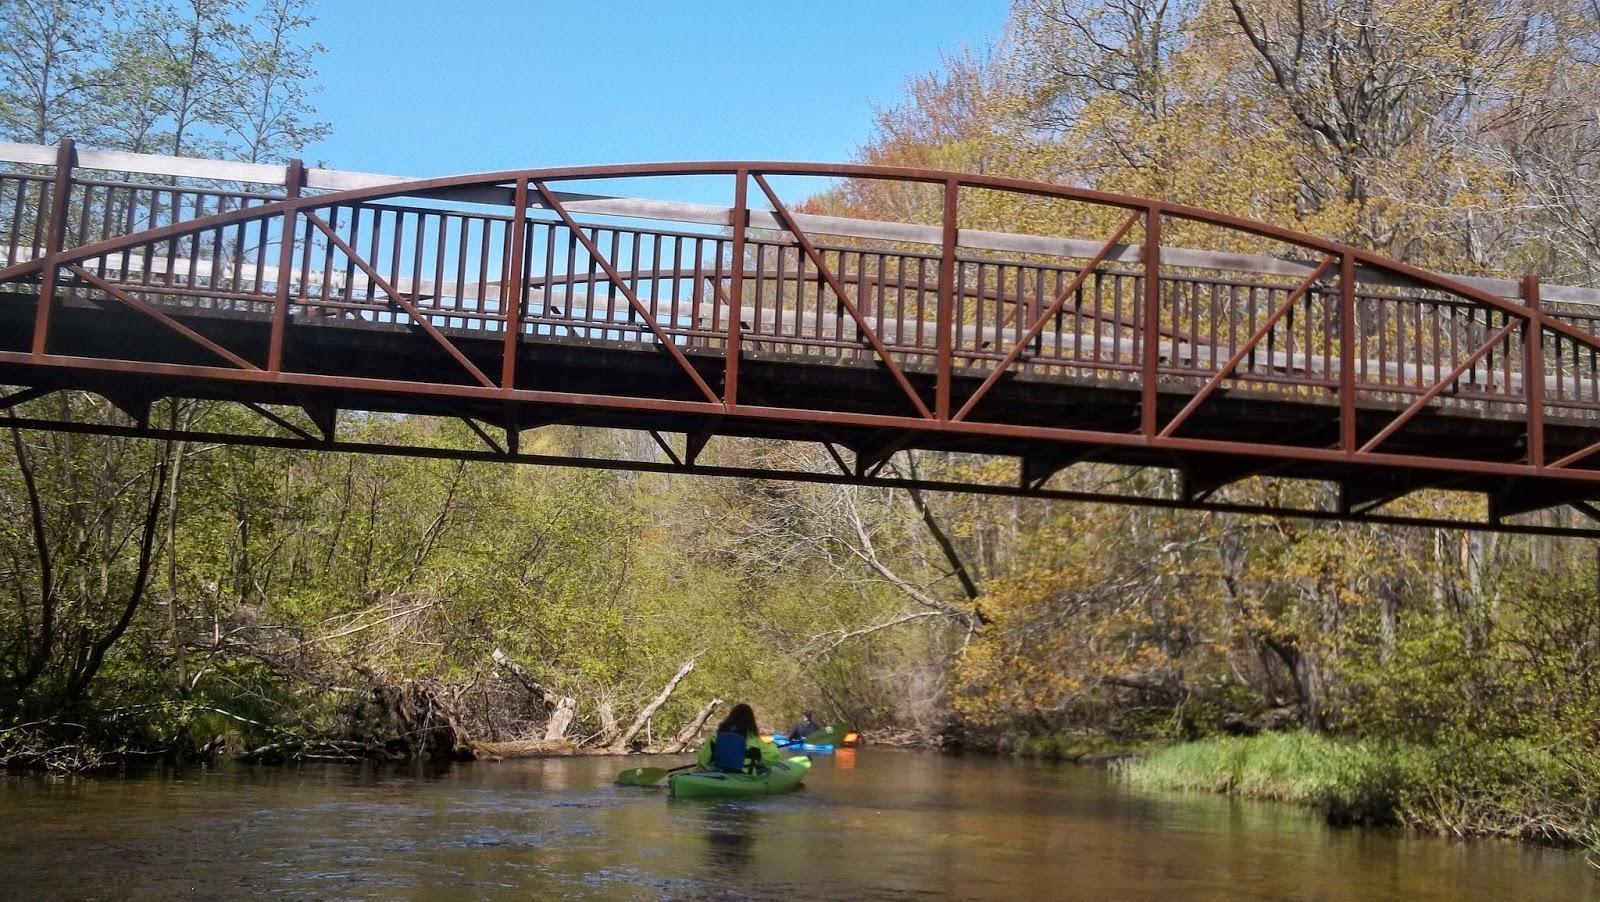 Kayaking Michigan Rivers: Pigeon River May 17, 2014